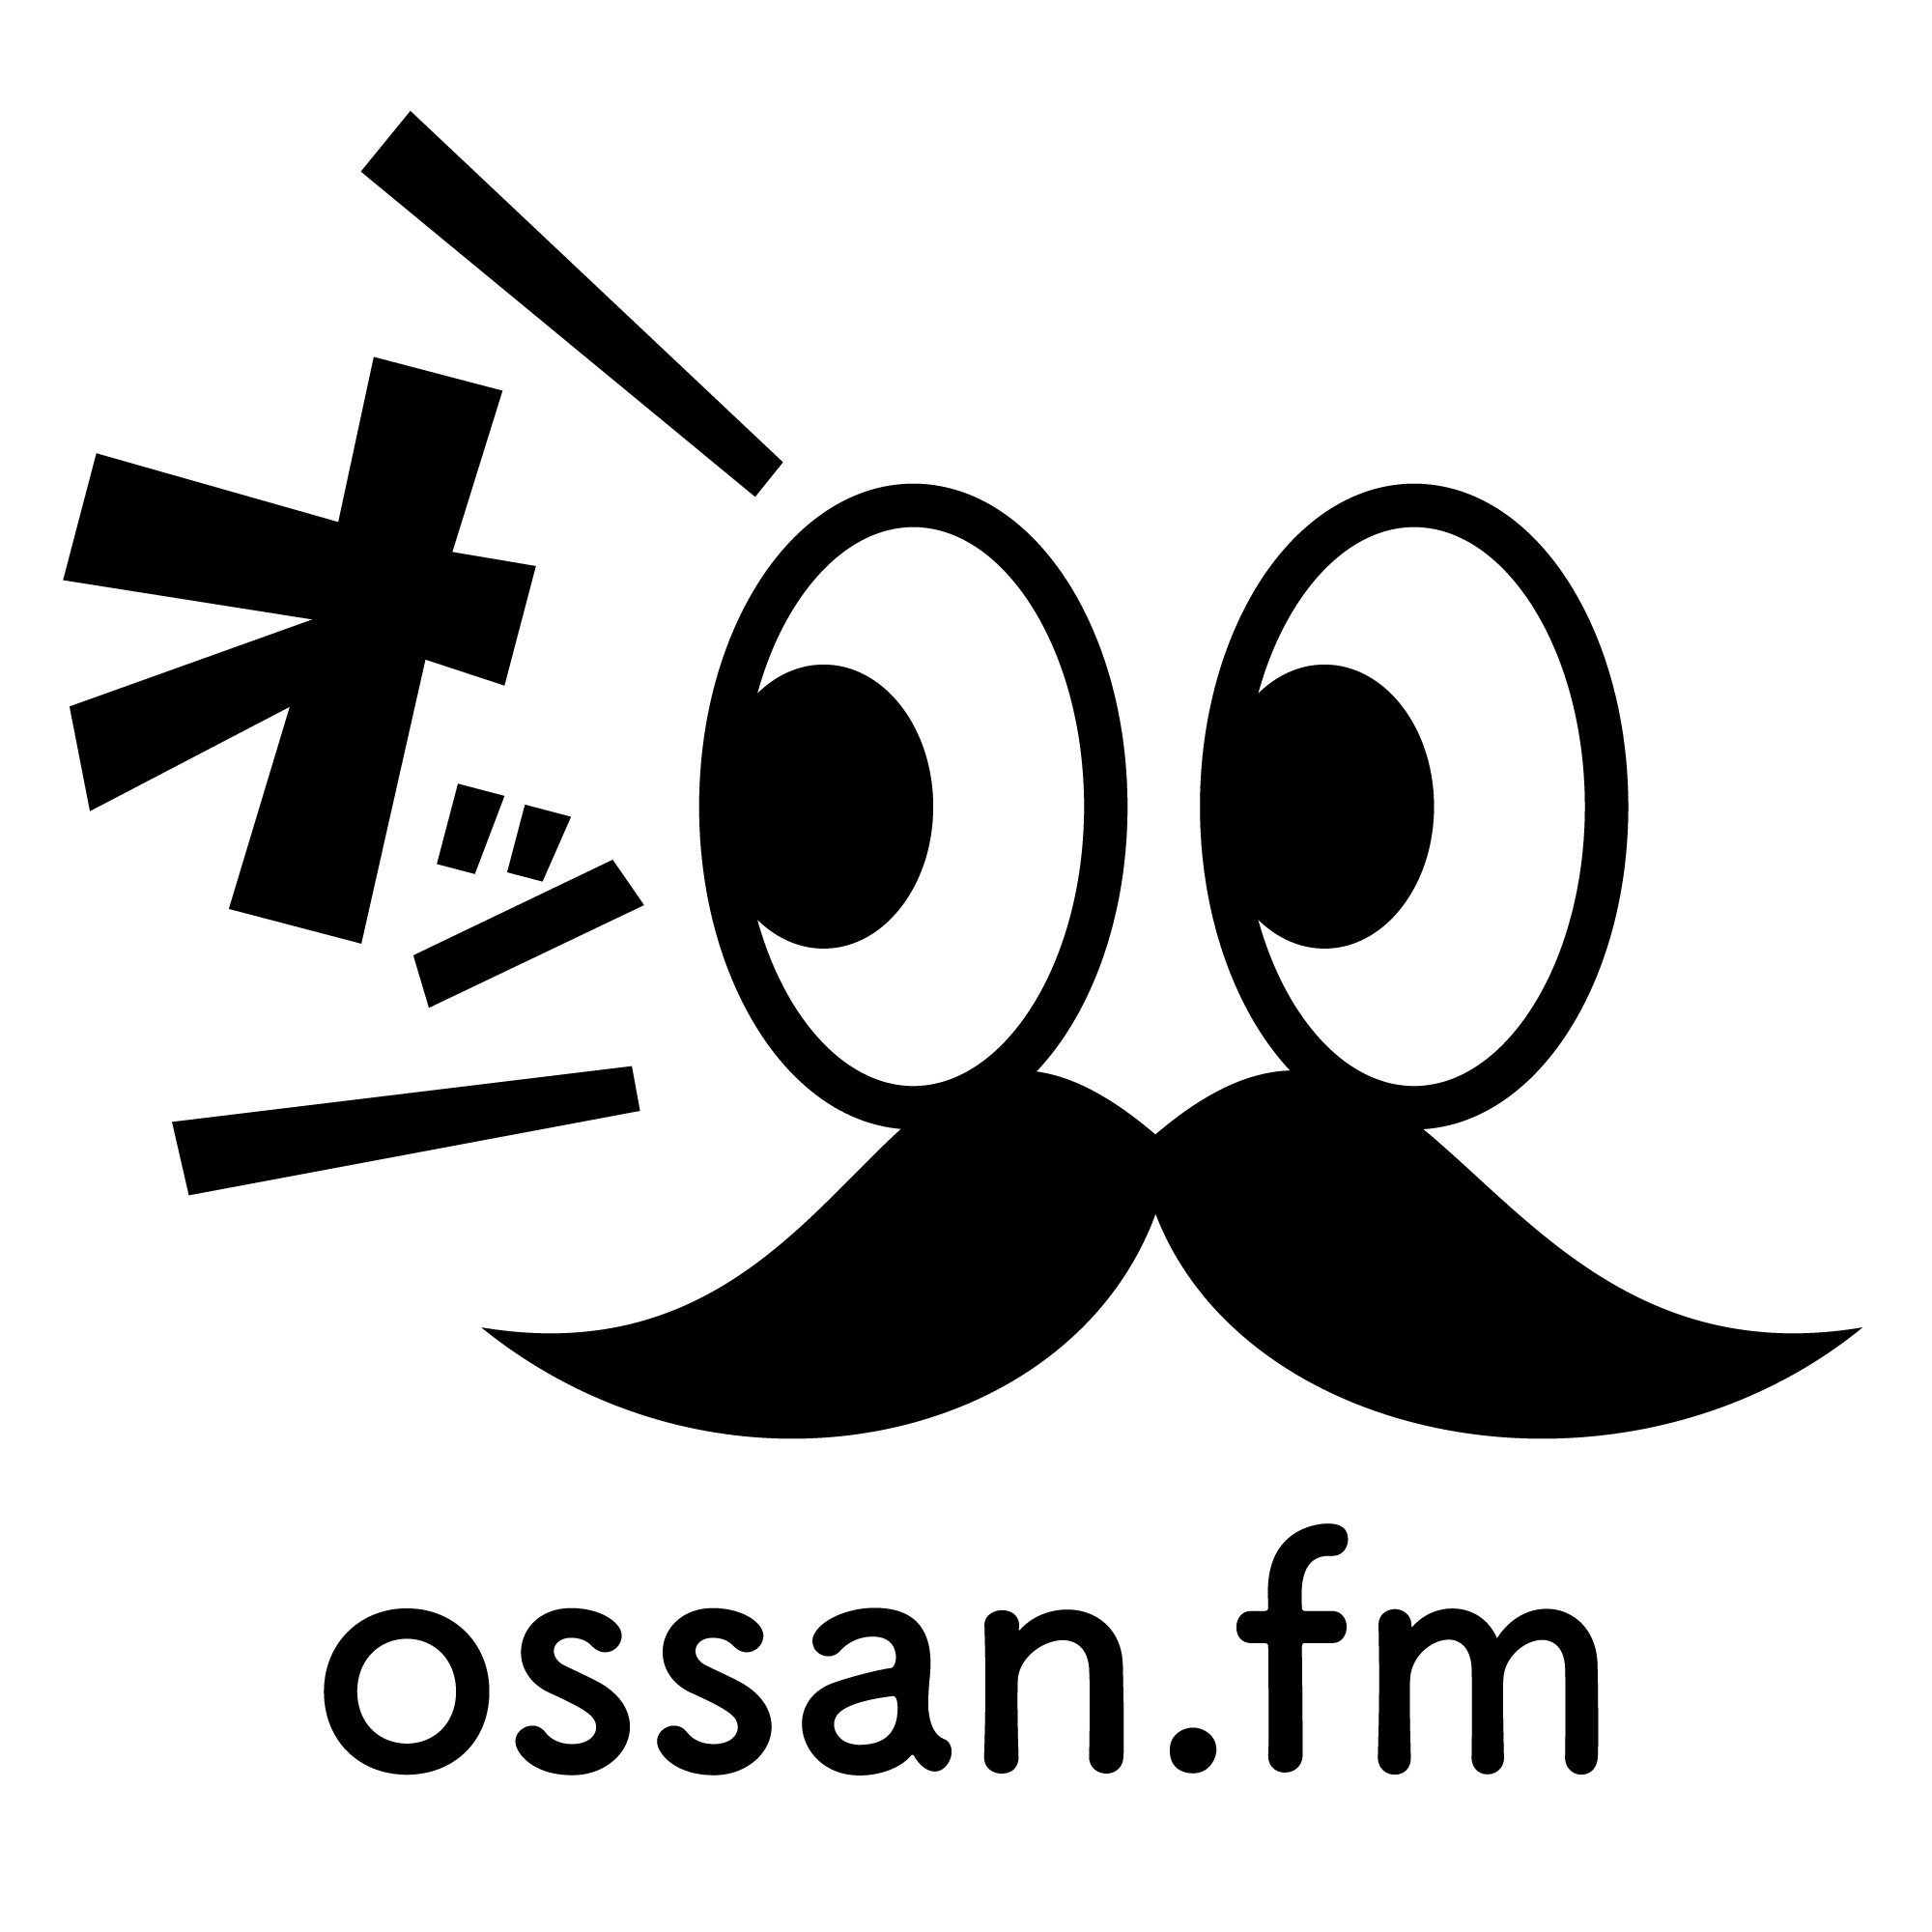 Ossan.fm